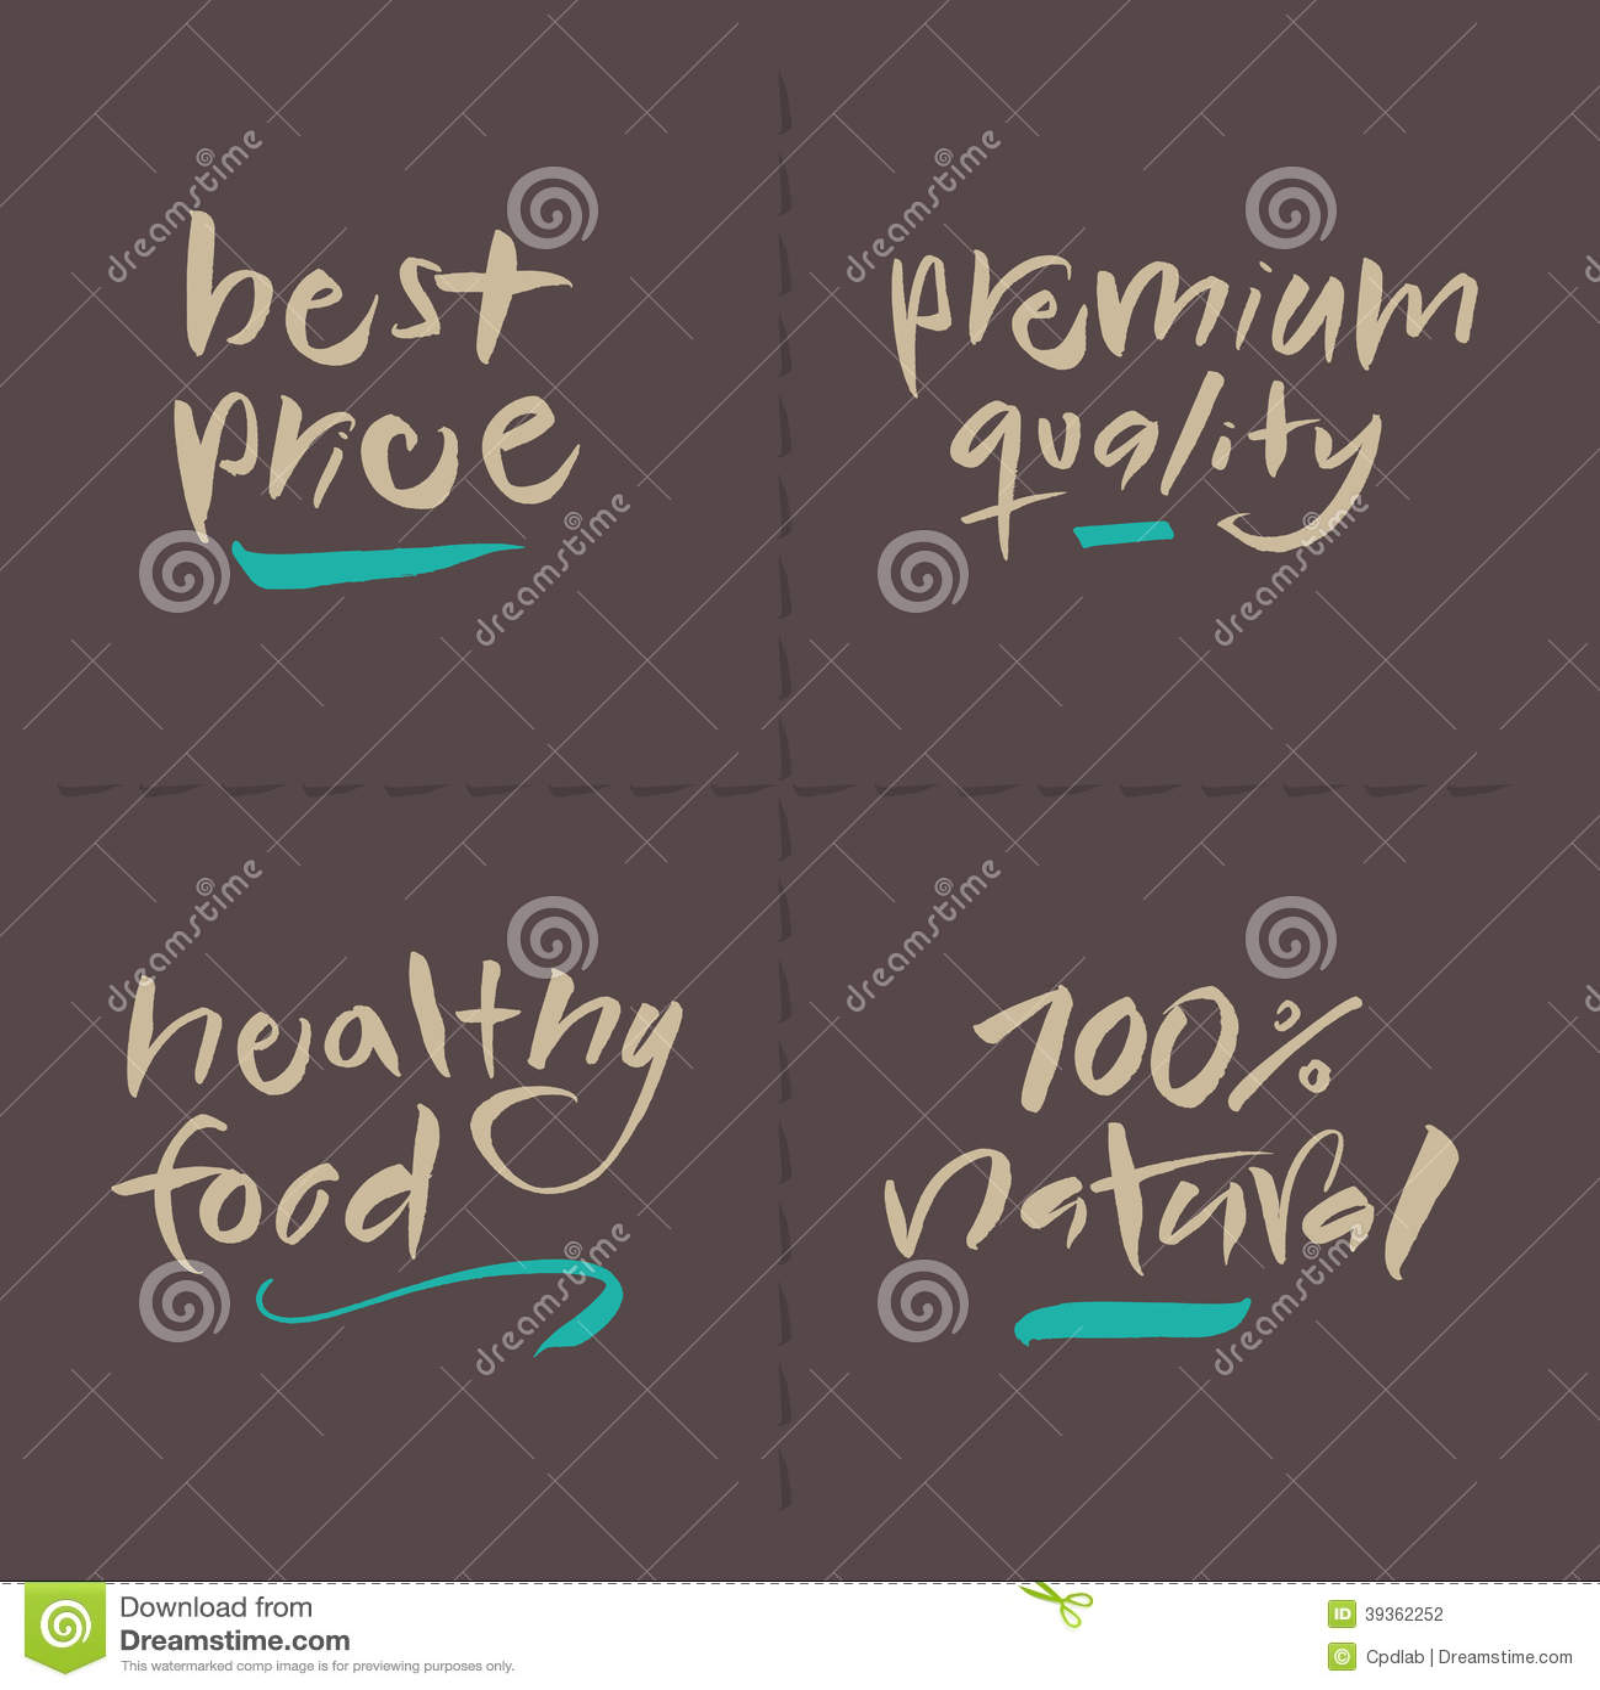 Premium Pricing: Hand Written Vector Food Labels